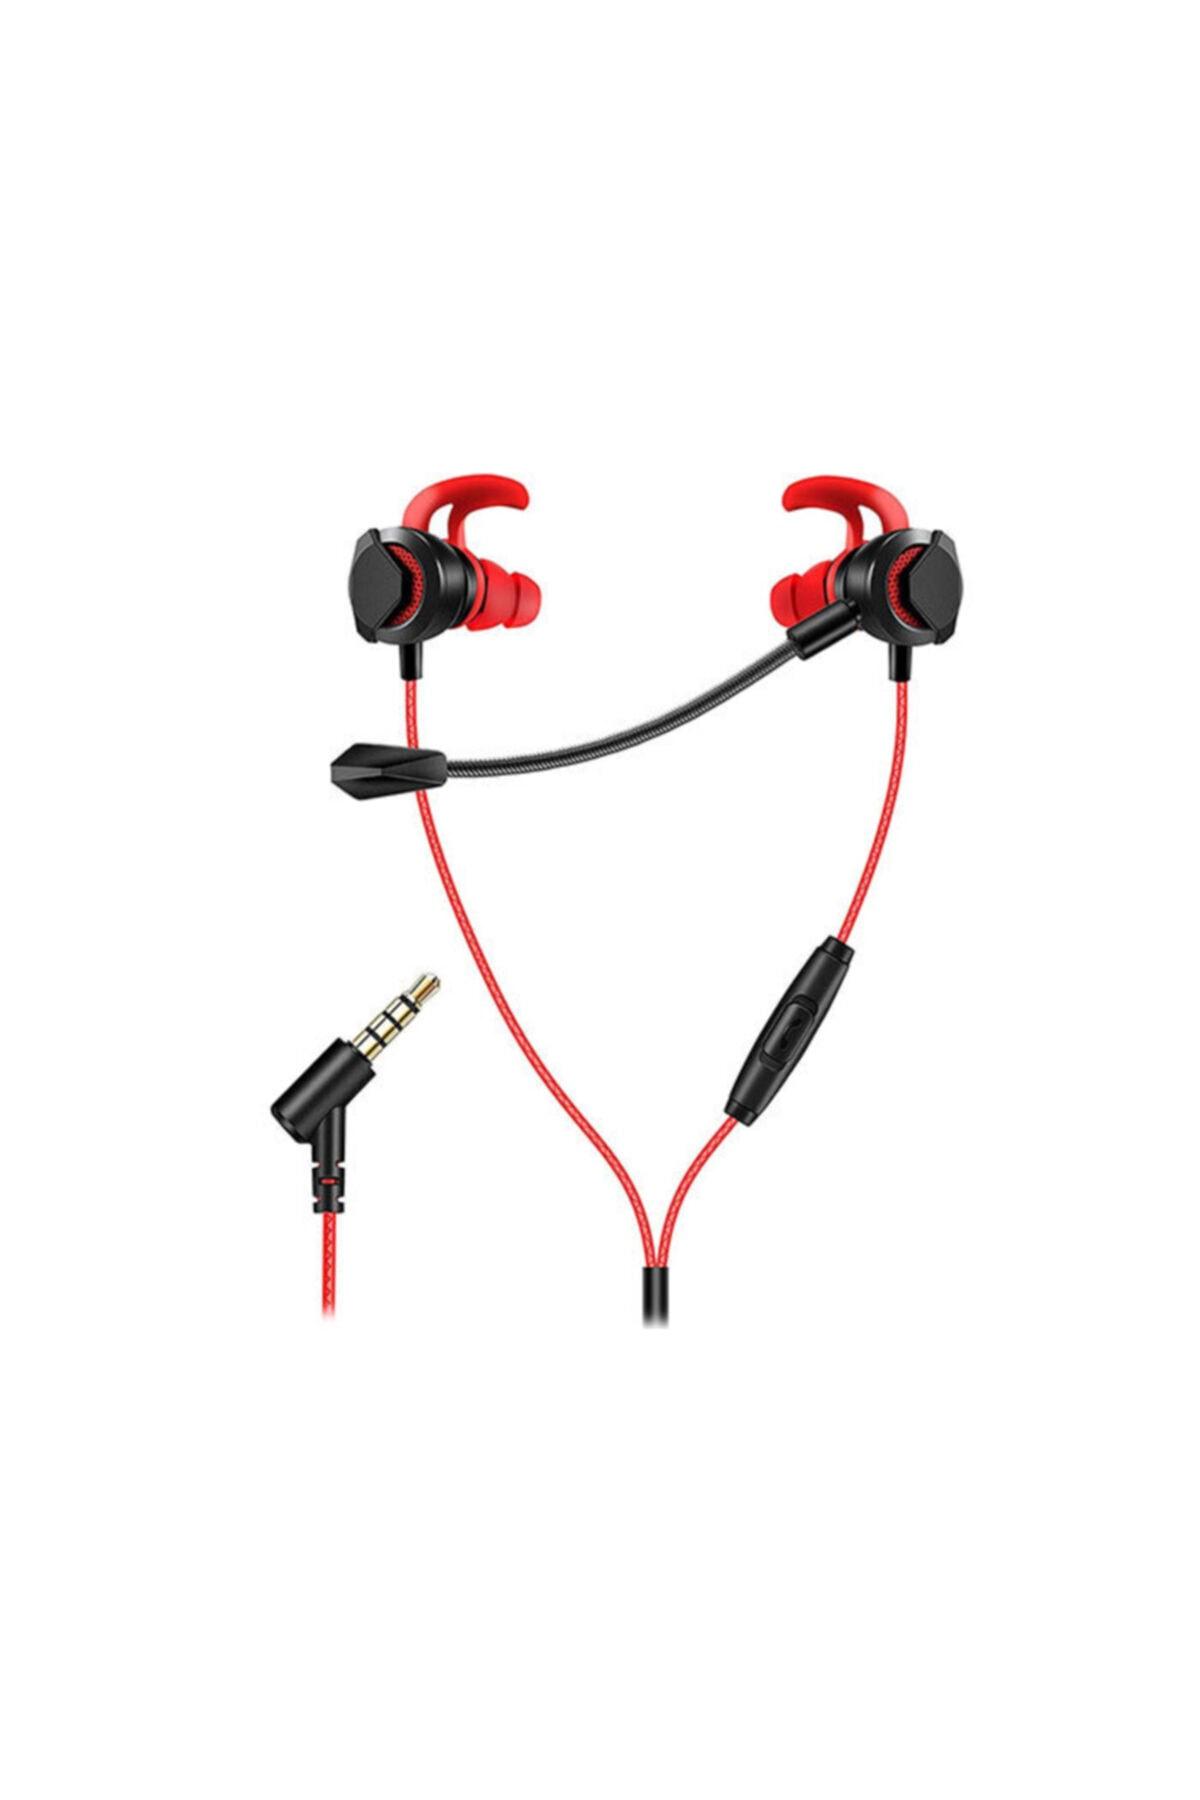 Rampage Mg-6 3,5mm Gaming Siyah/kırmızı Oyuncu Mikrofonlu Kulaklık 2